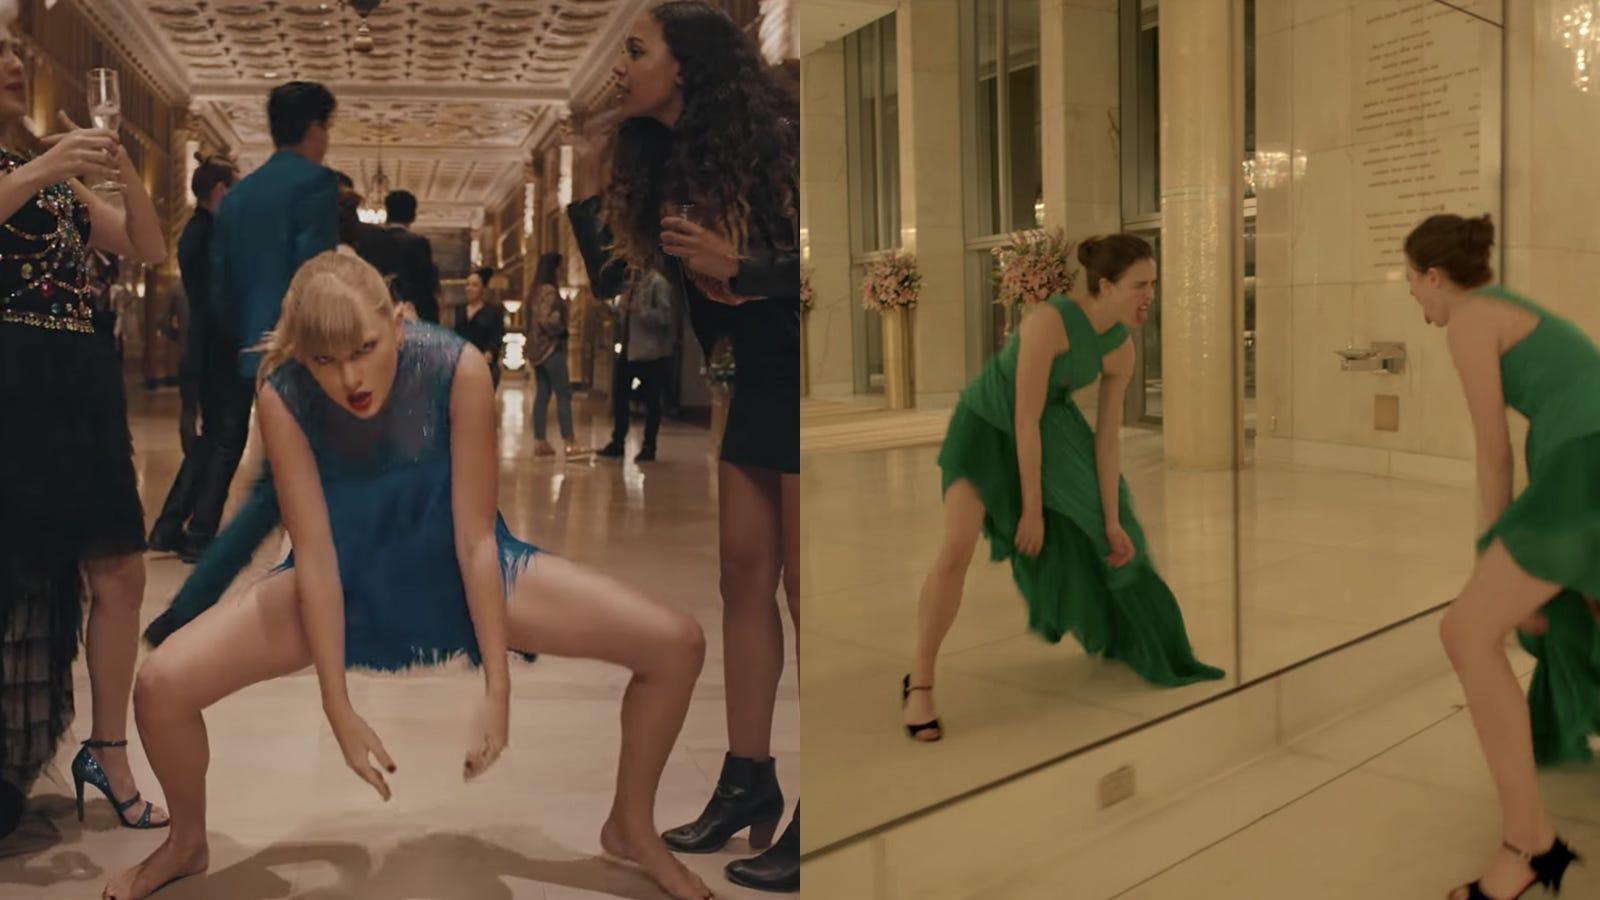 szkyhdgija8jiztxurt3 - Style House Kenzo Had a Gorgeous Response to Claims Taylor Swift Ripped Off Their Recent Fragrance Advertisement